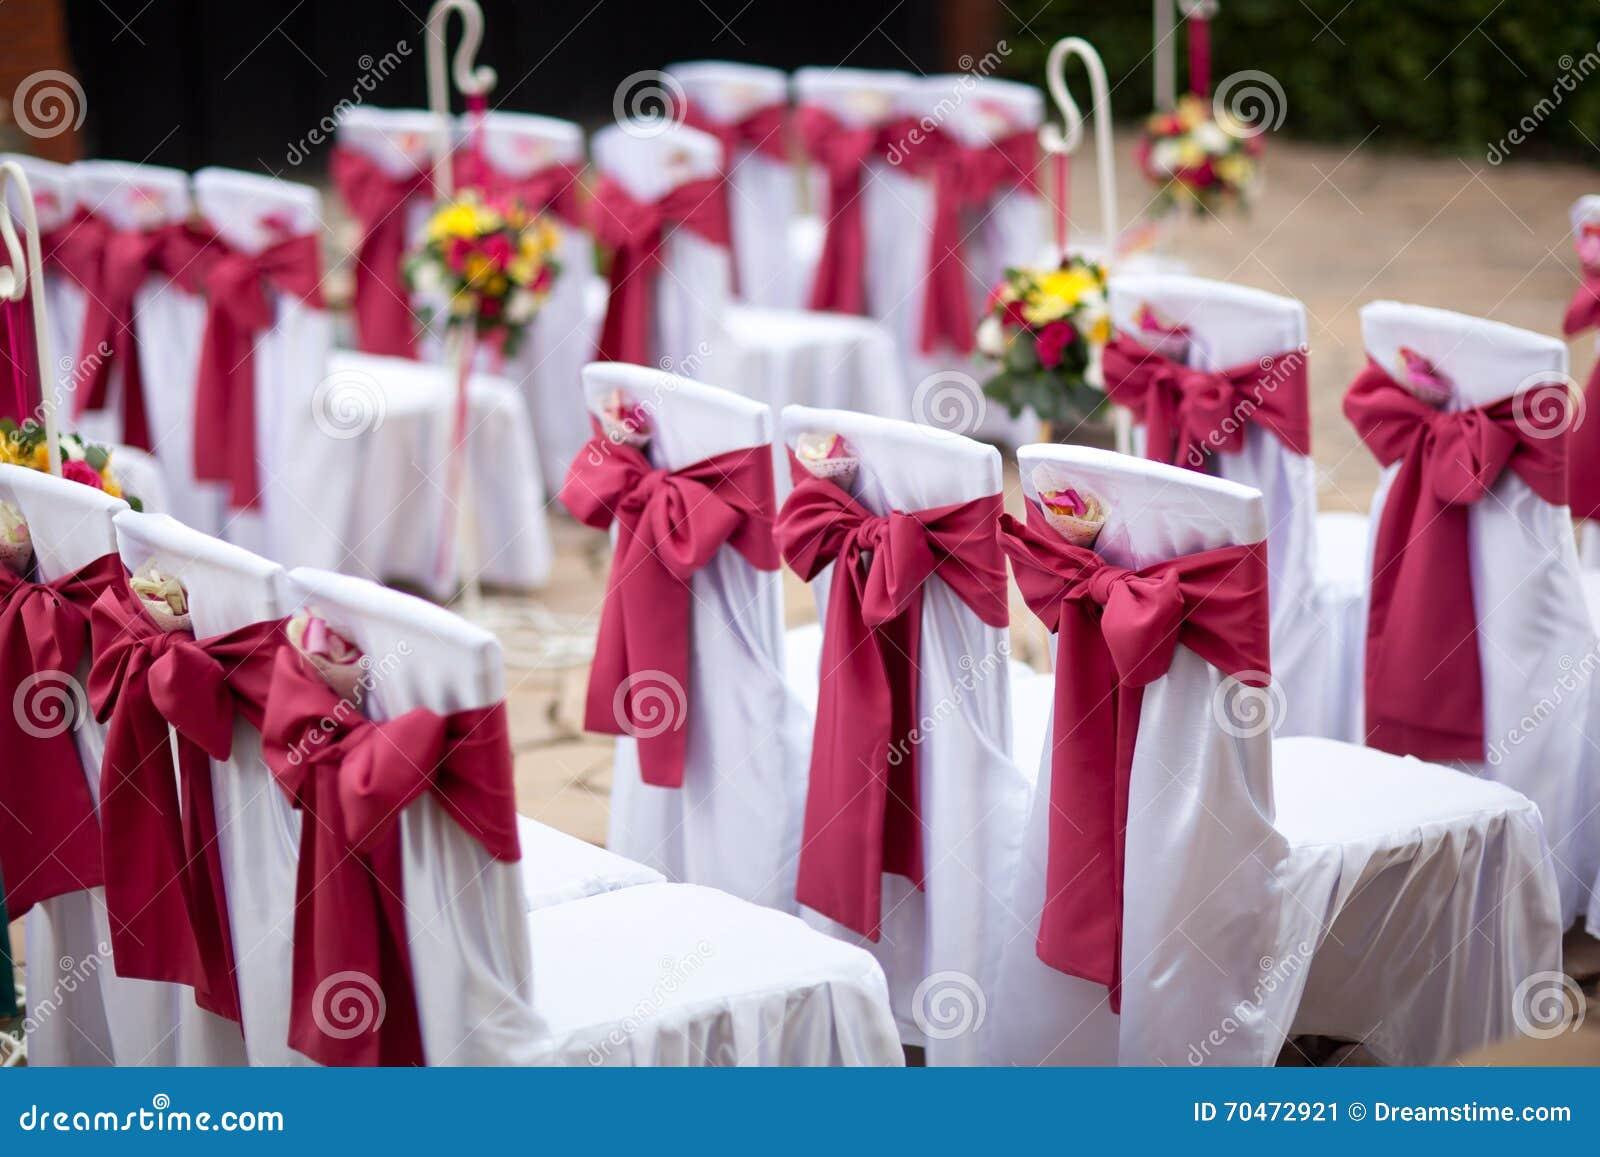 Phenomenal Wedding Chairs Stock Image Image Of Wedding Dining 70472921 Lamtechconsult Wood Chair Design Ideas Lamtechconsultcom